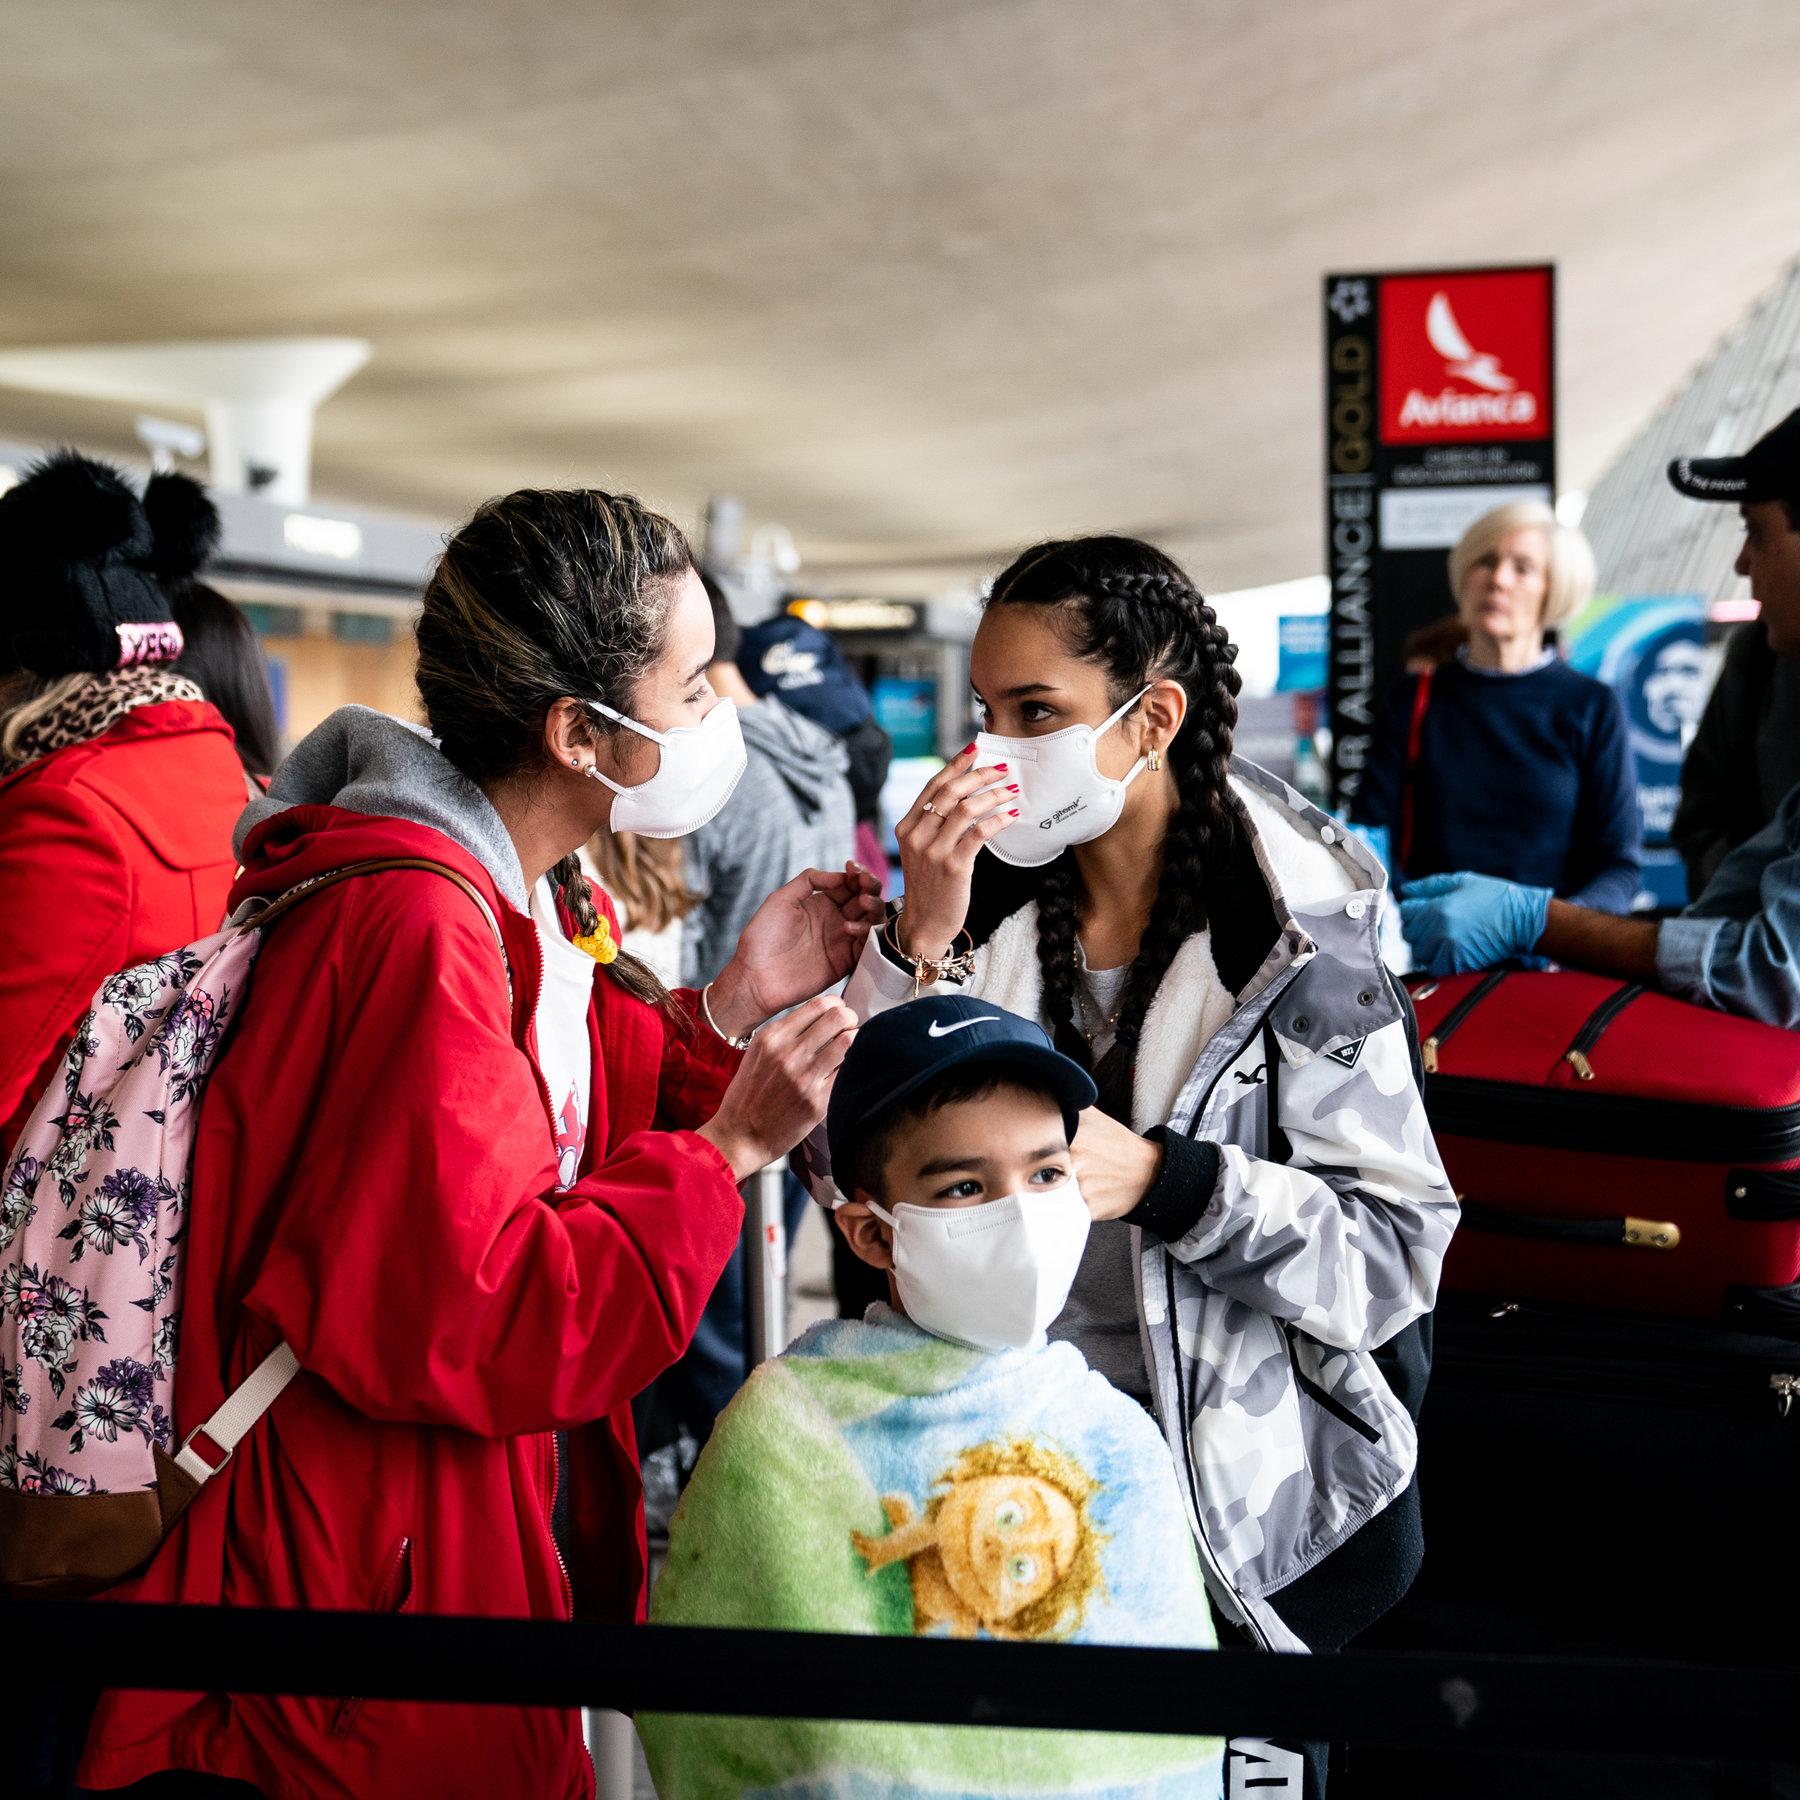 Travelers From Coronavirus Hot Spots Say They Faced No Screening ...